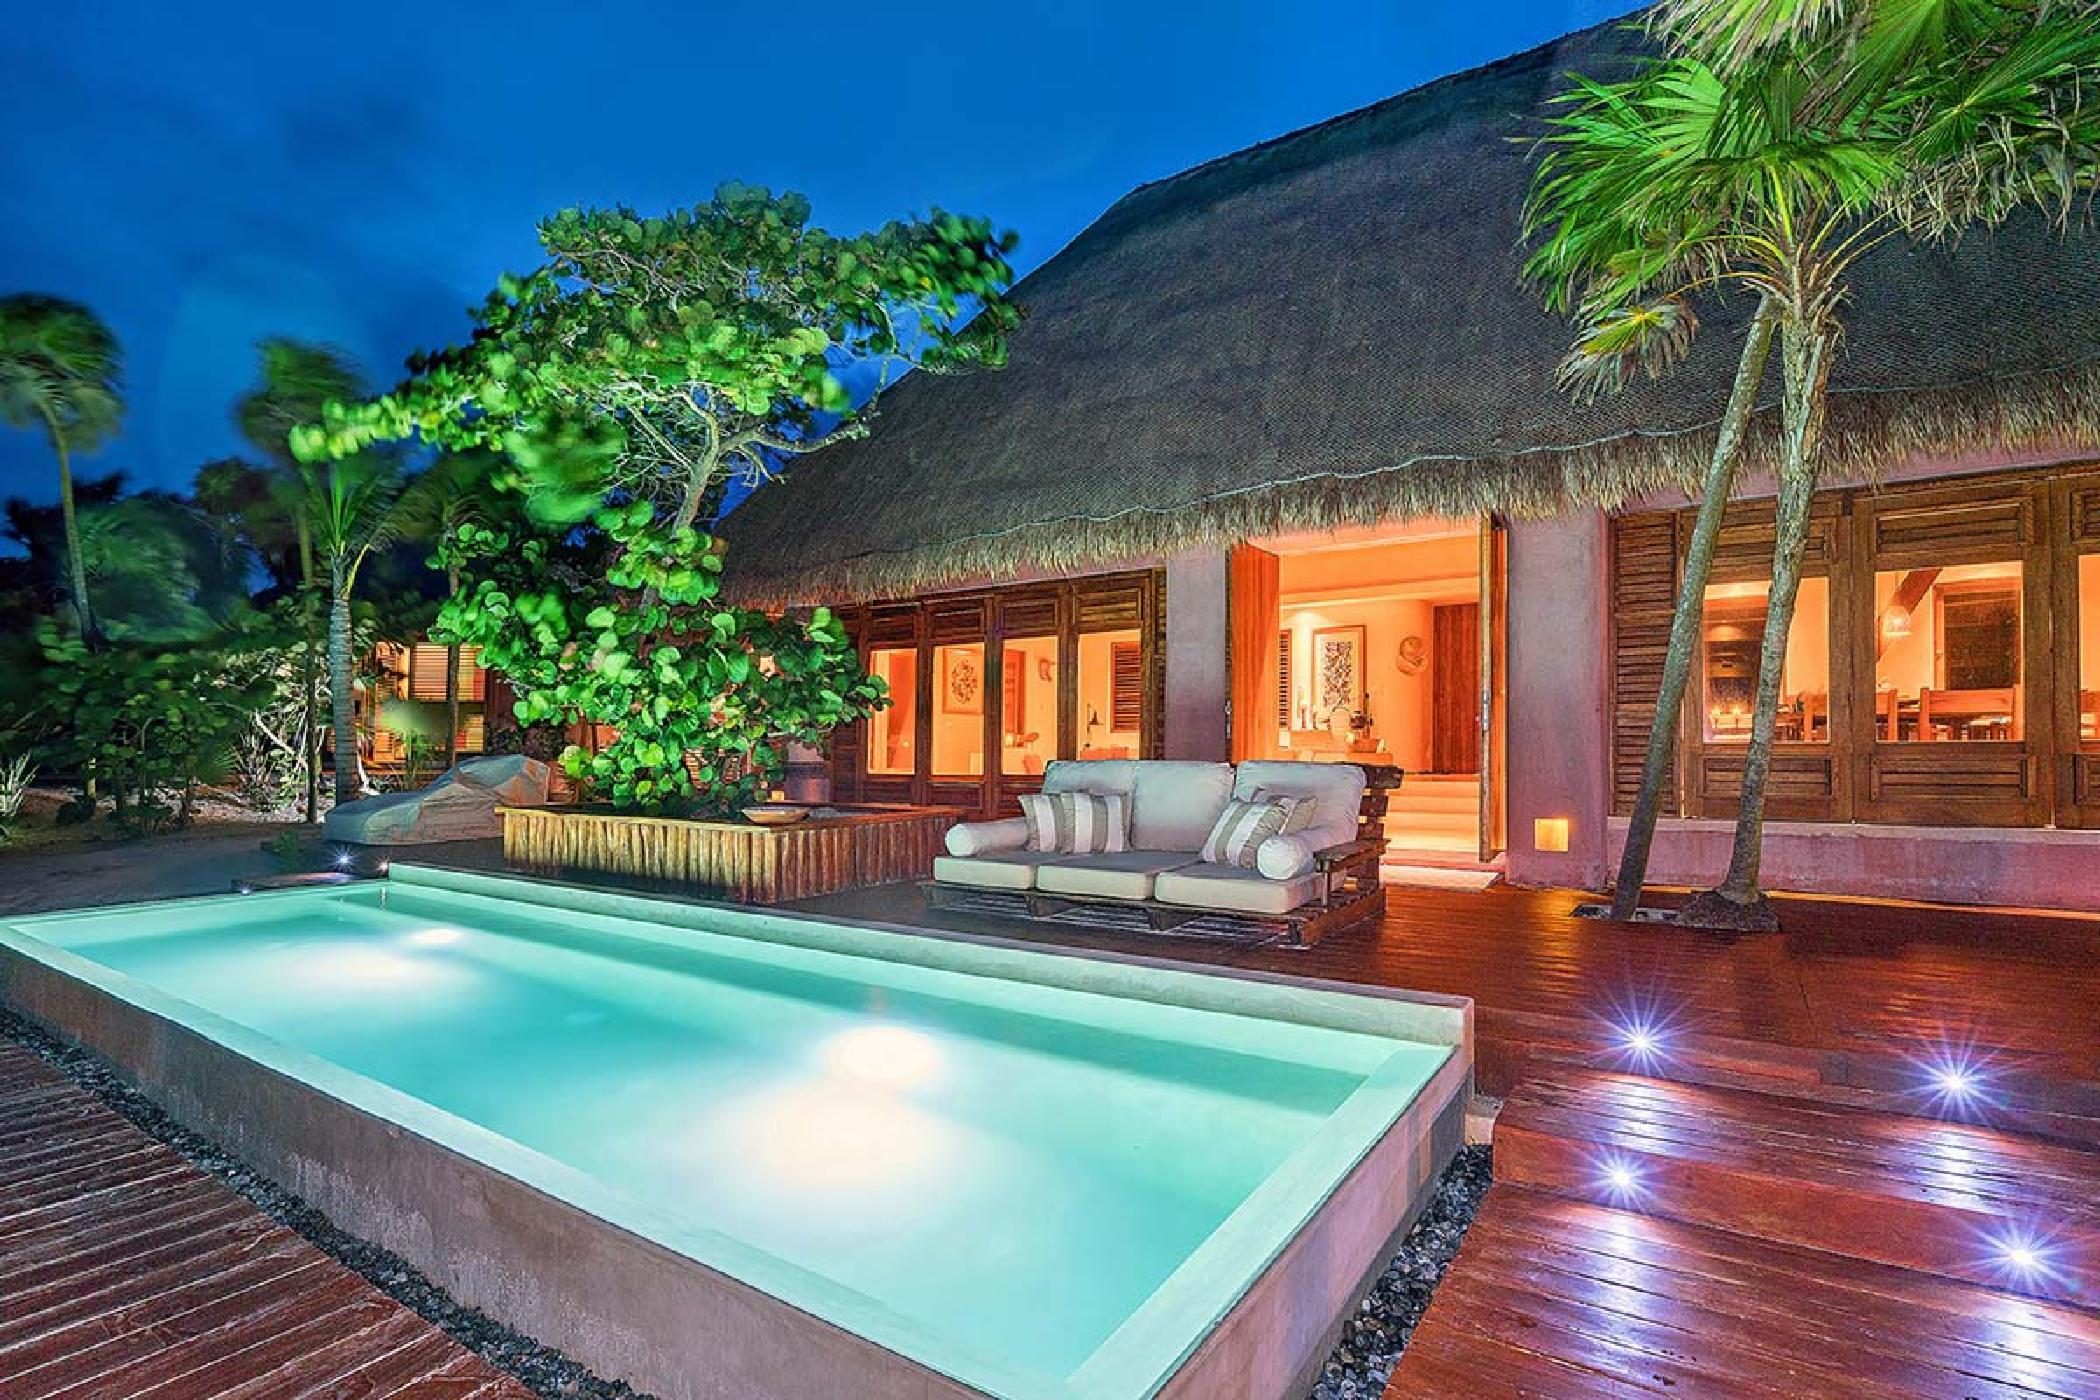 Maya_Luxe_Riviera_Maya_Luxury_Villas_Experiences_Sian_Kaan_Tulum_4_Bedrooms_Casa_Cantarena_30.jpg